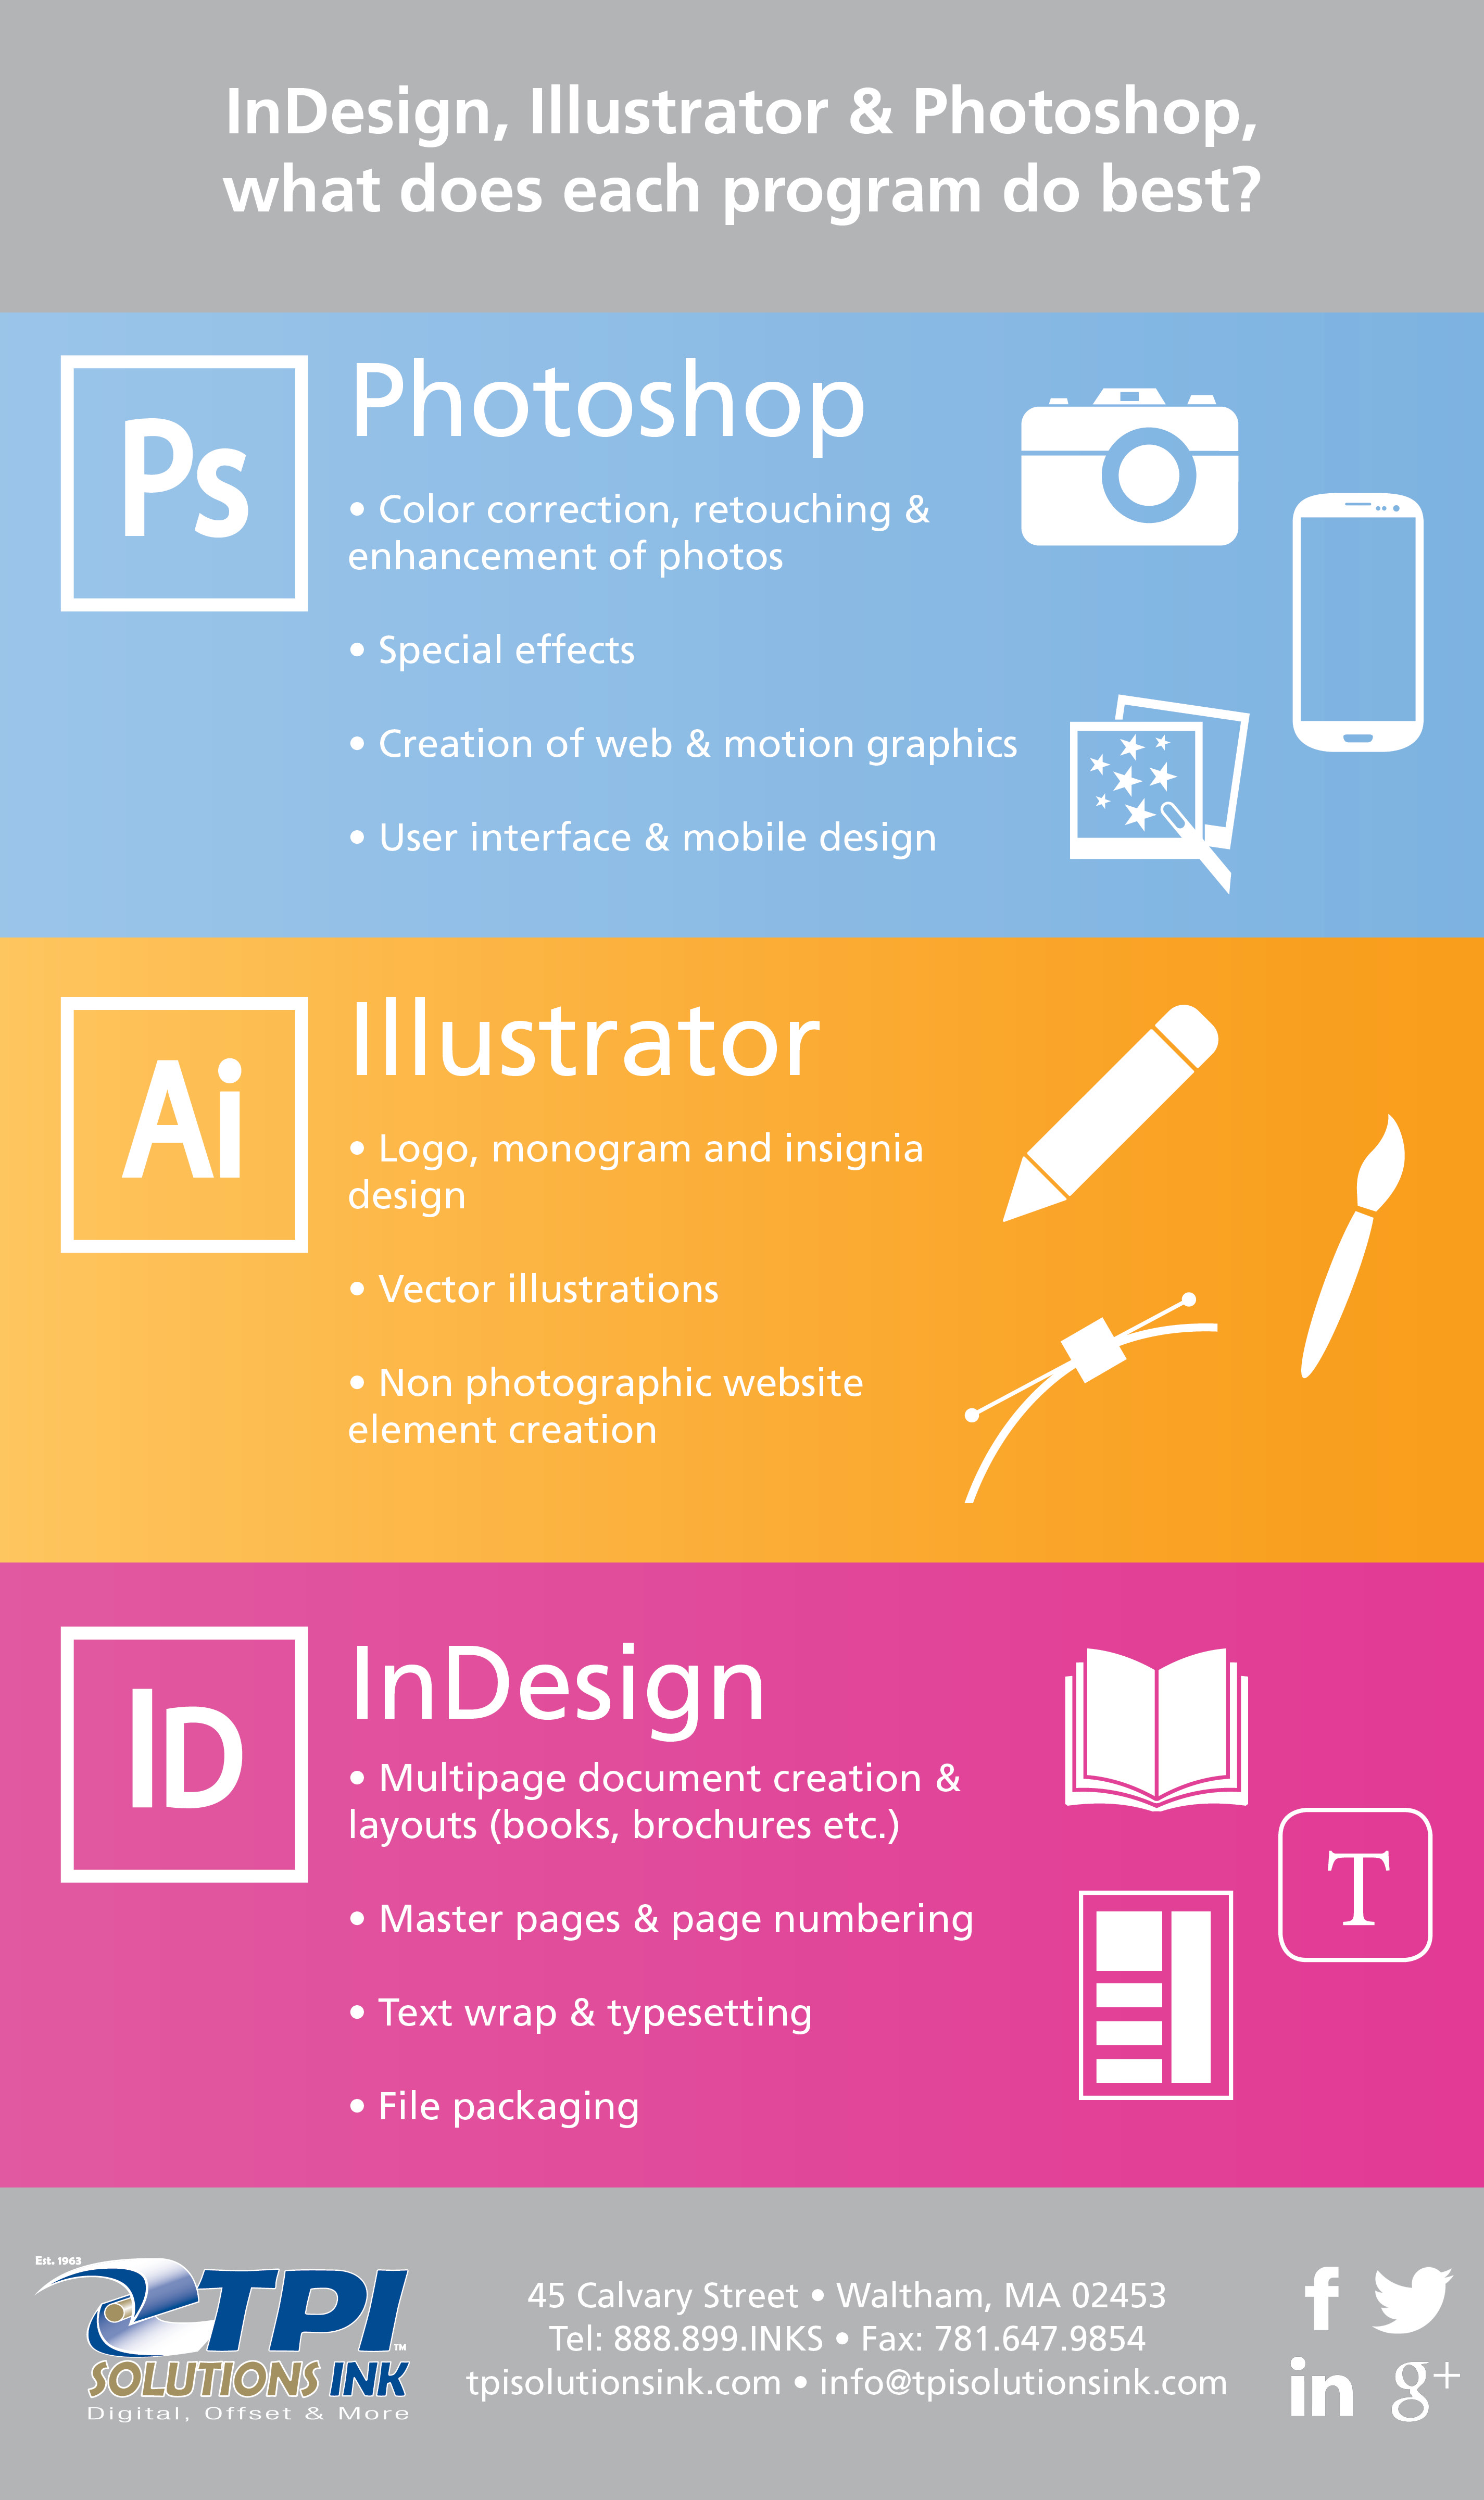 Infographic: Adobe InDesign, Illustrator & Photoshop